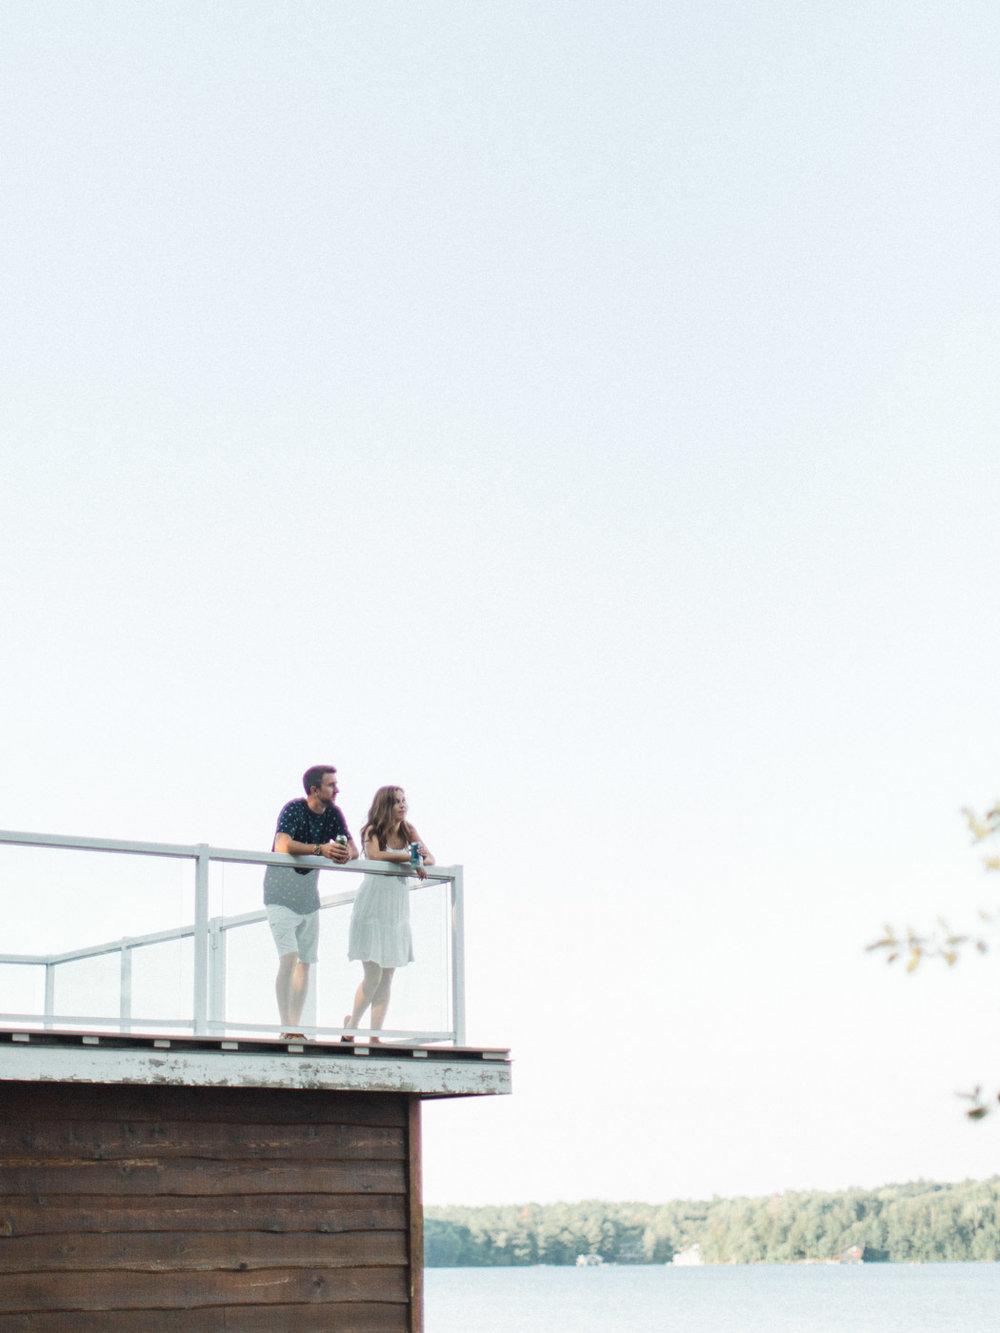 muskoka-wedding-photographer-adventurous-couples-engagement-session-lake-44.jpg